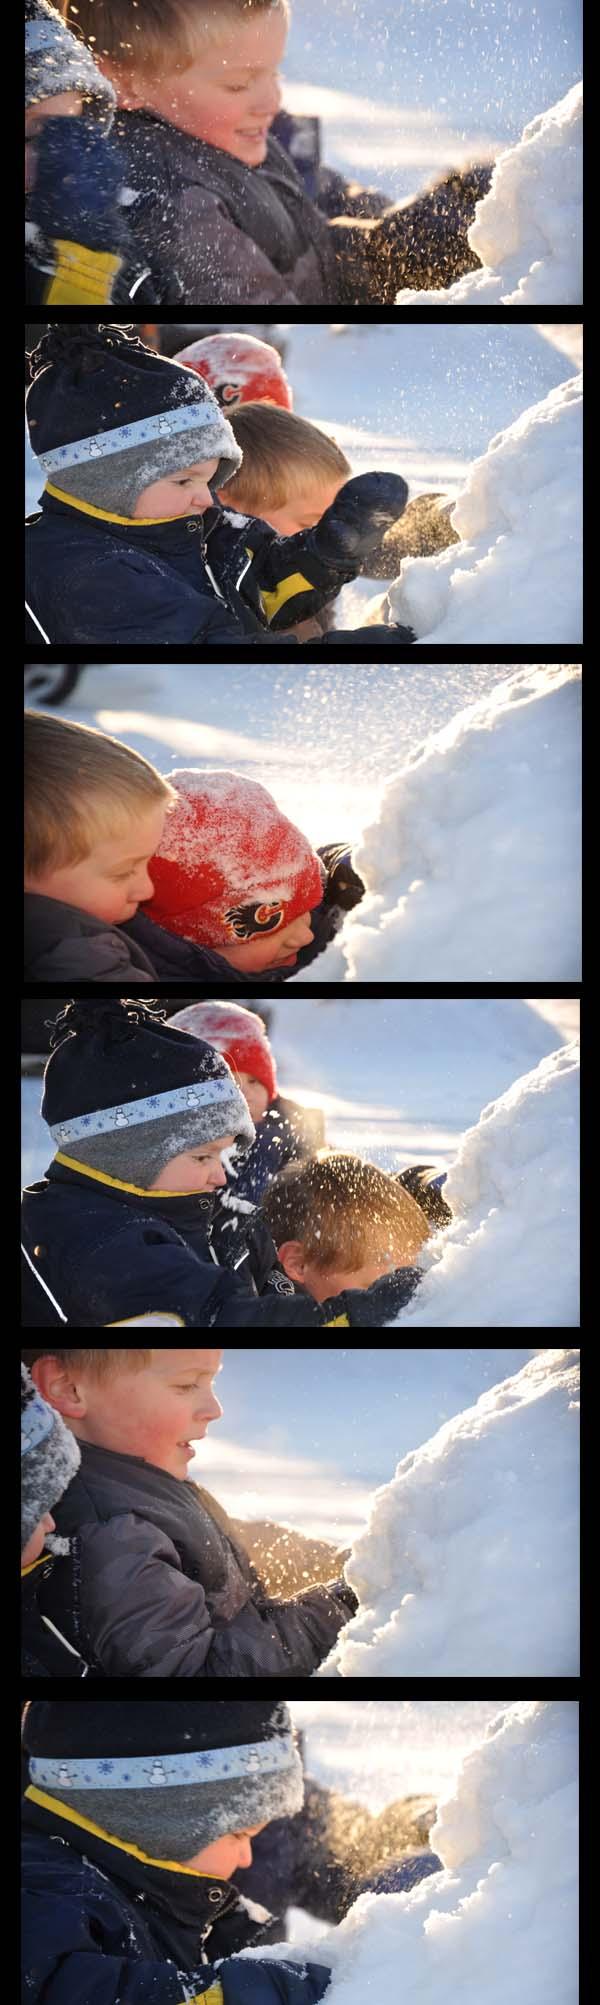 action snow-1